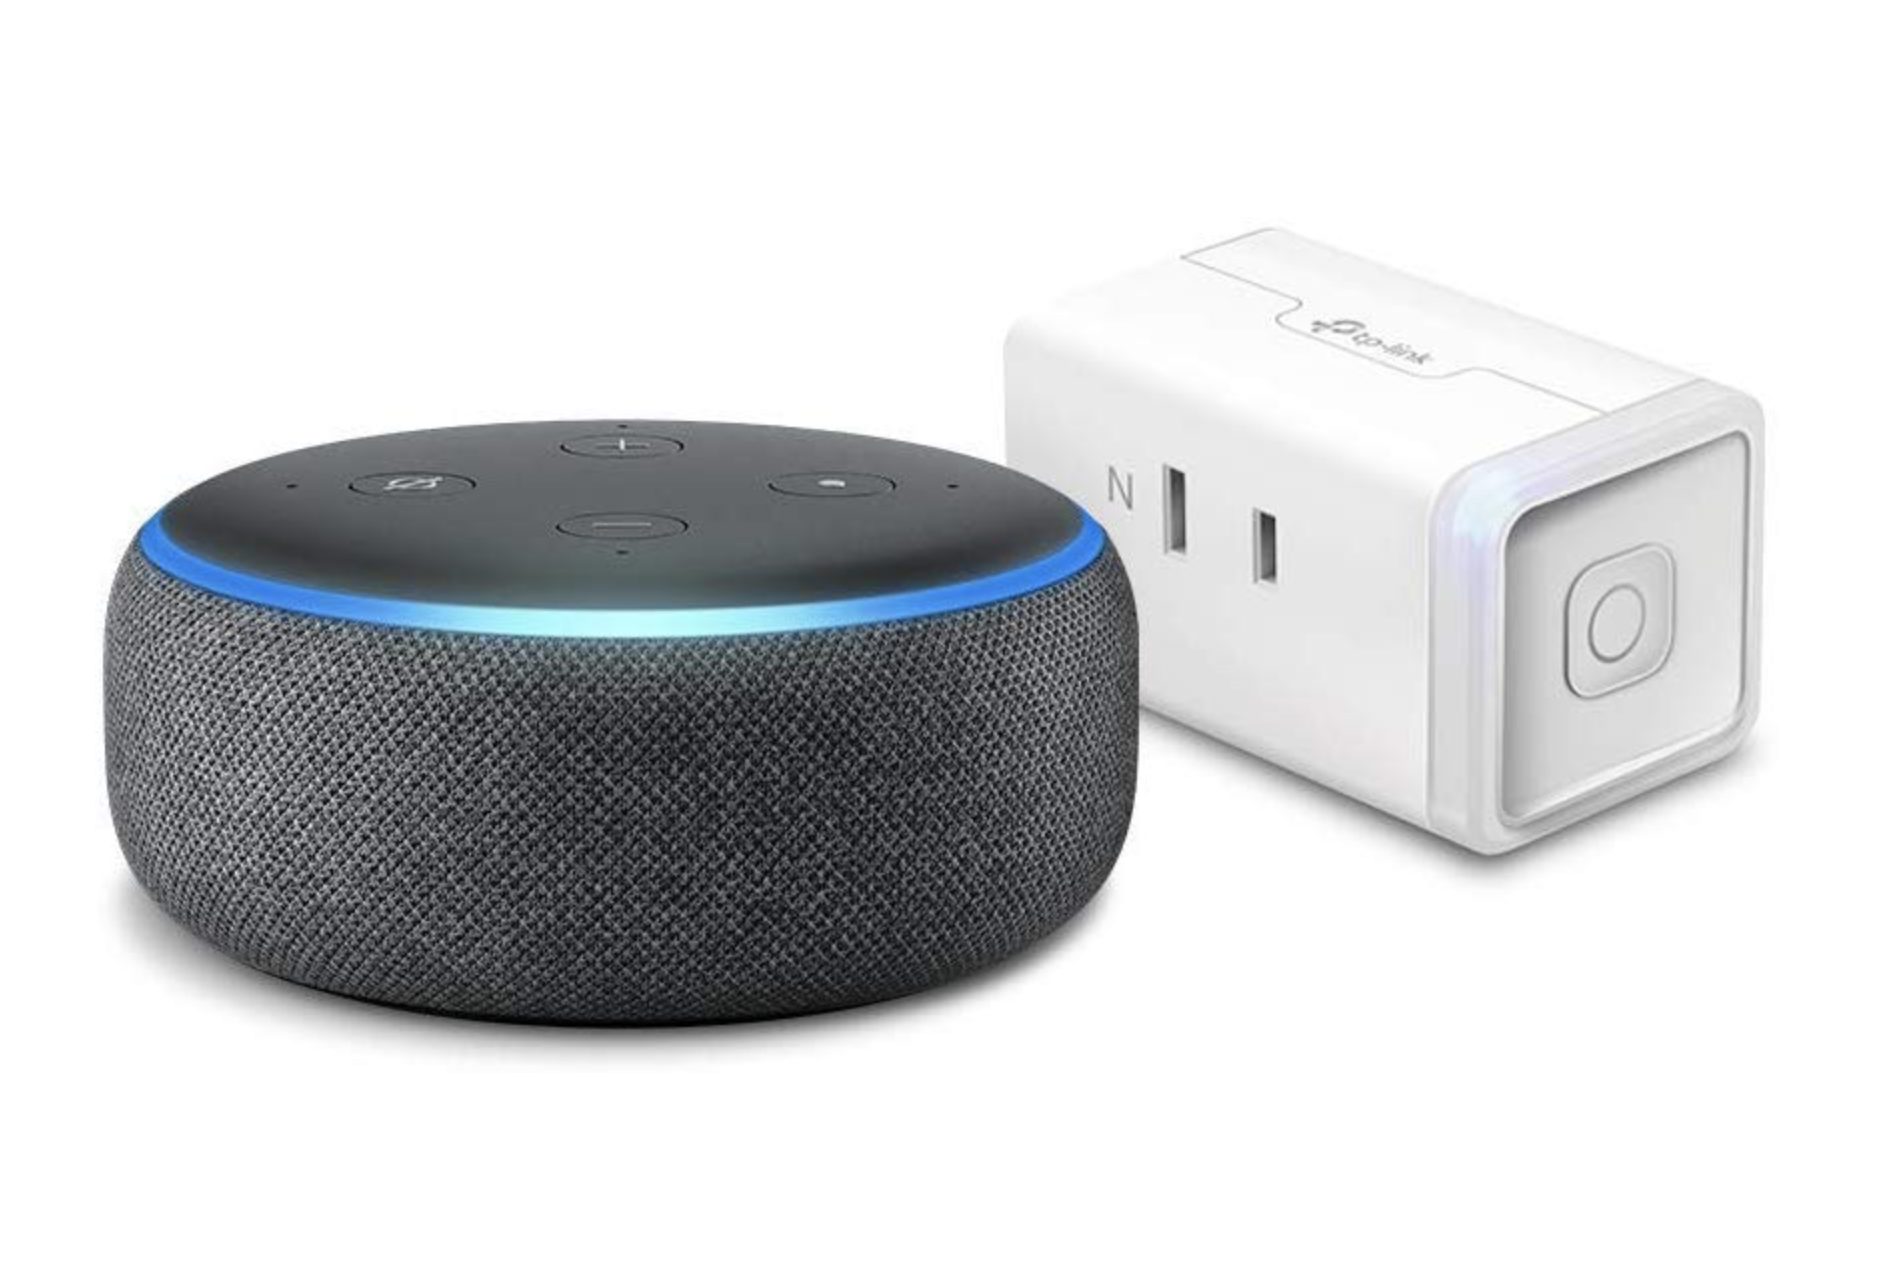 Echo Dot  第3世代 - スマートスピーカー with Alexa、チャコール + TP-Link WiFi スマートプラグ 直差しコンセント 音声コントロール